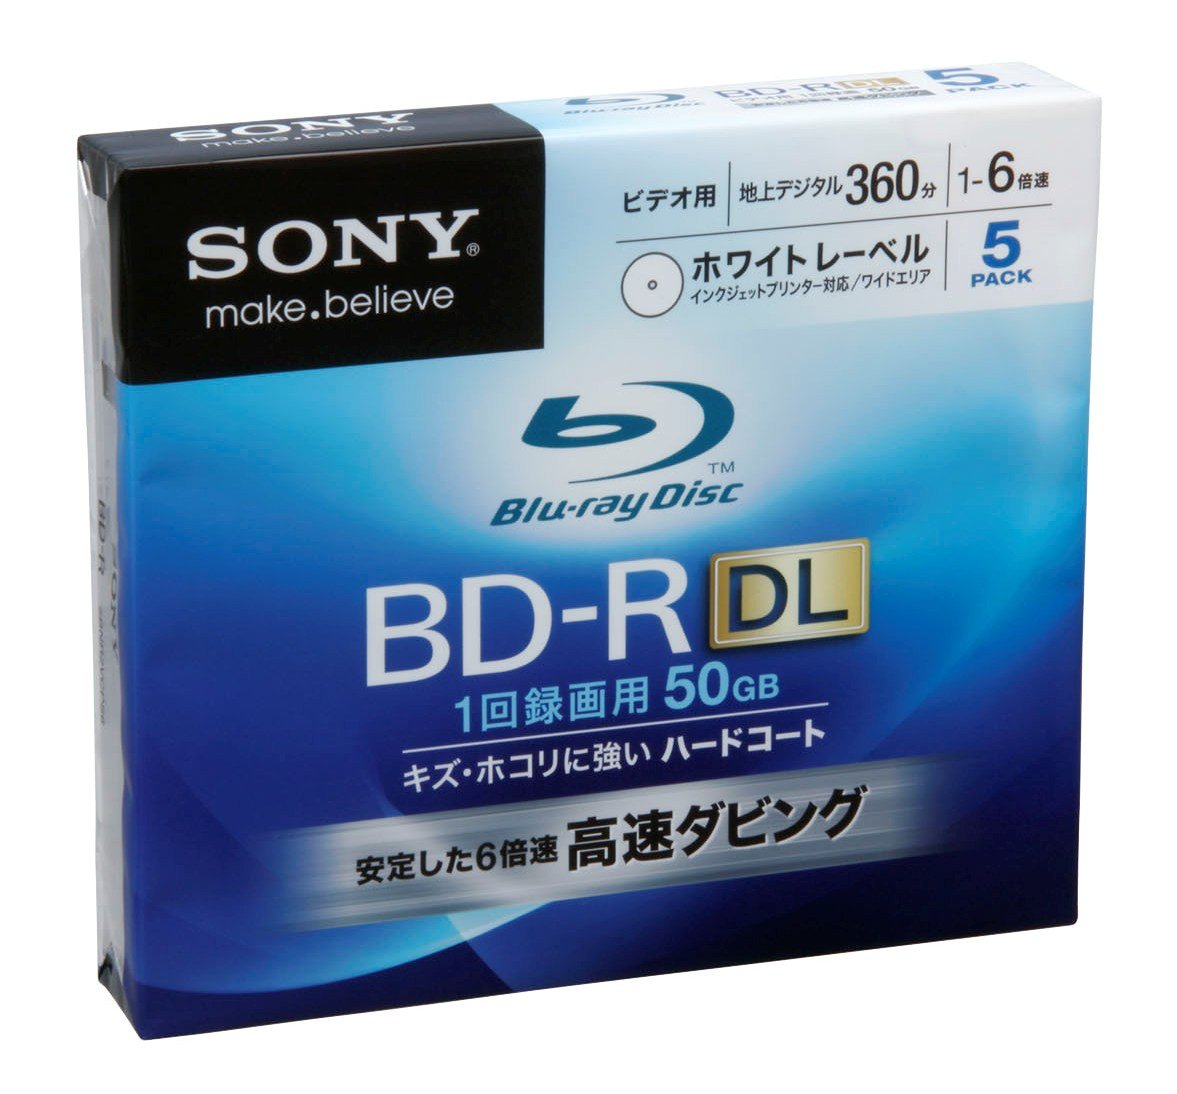 Sony Blu-ray Disc 5 Pack - 50GB 6x Speed BD-R DL Version 1.3